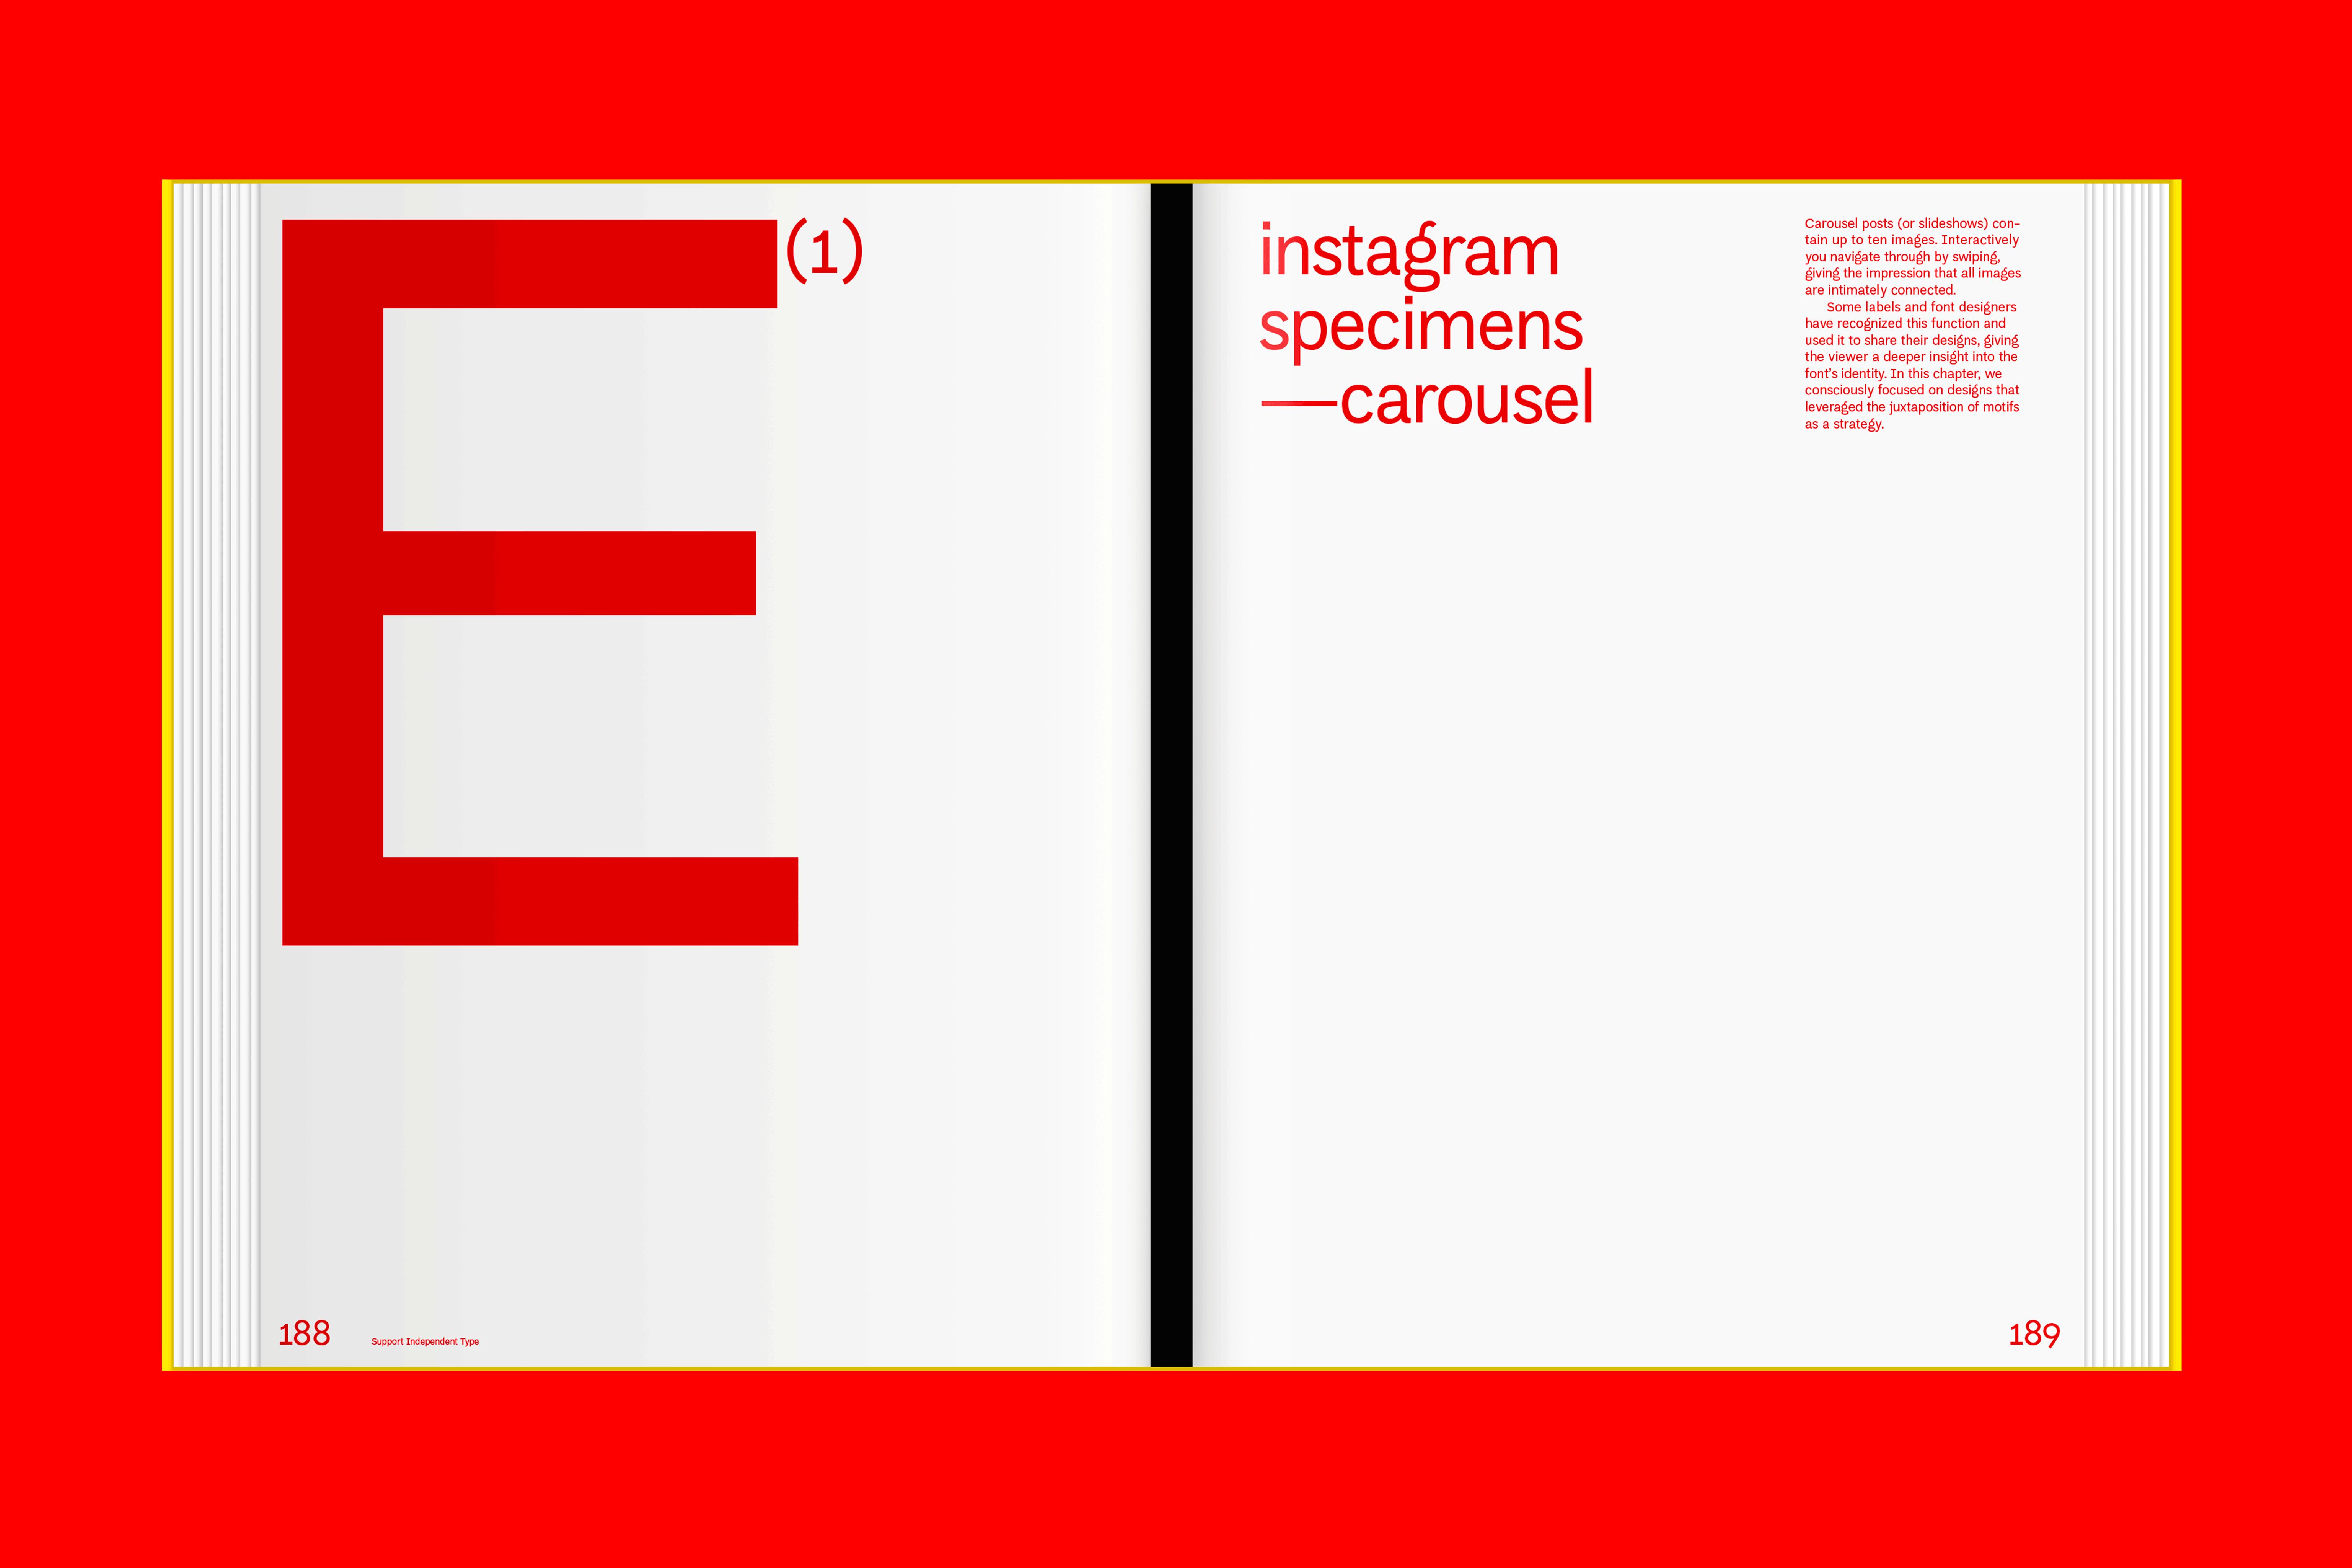 Slanted-Publiaktionen-Slanted-Publishers-Support-Independent-Type_22